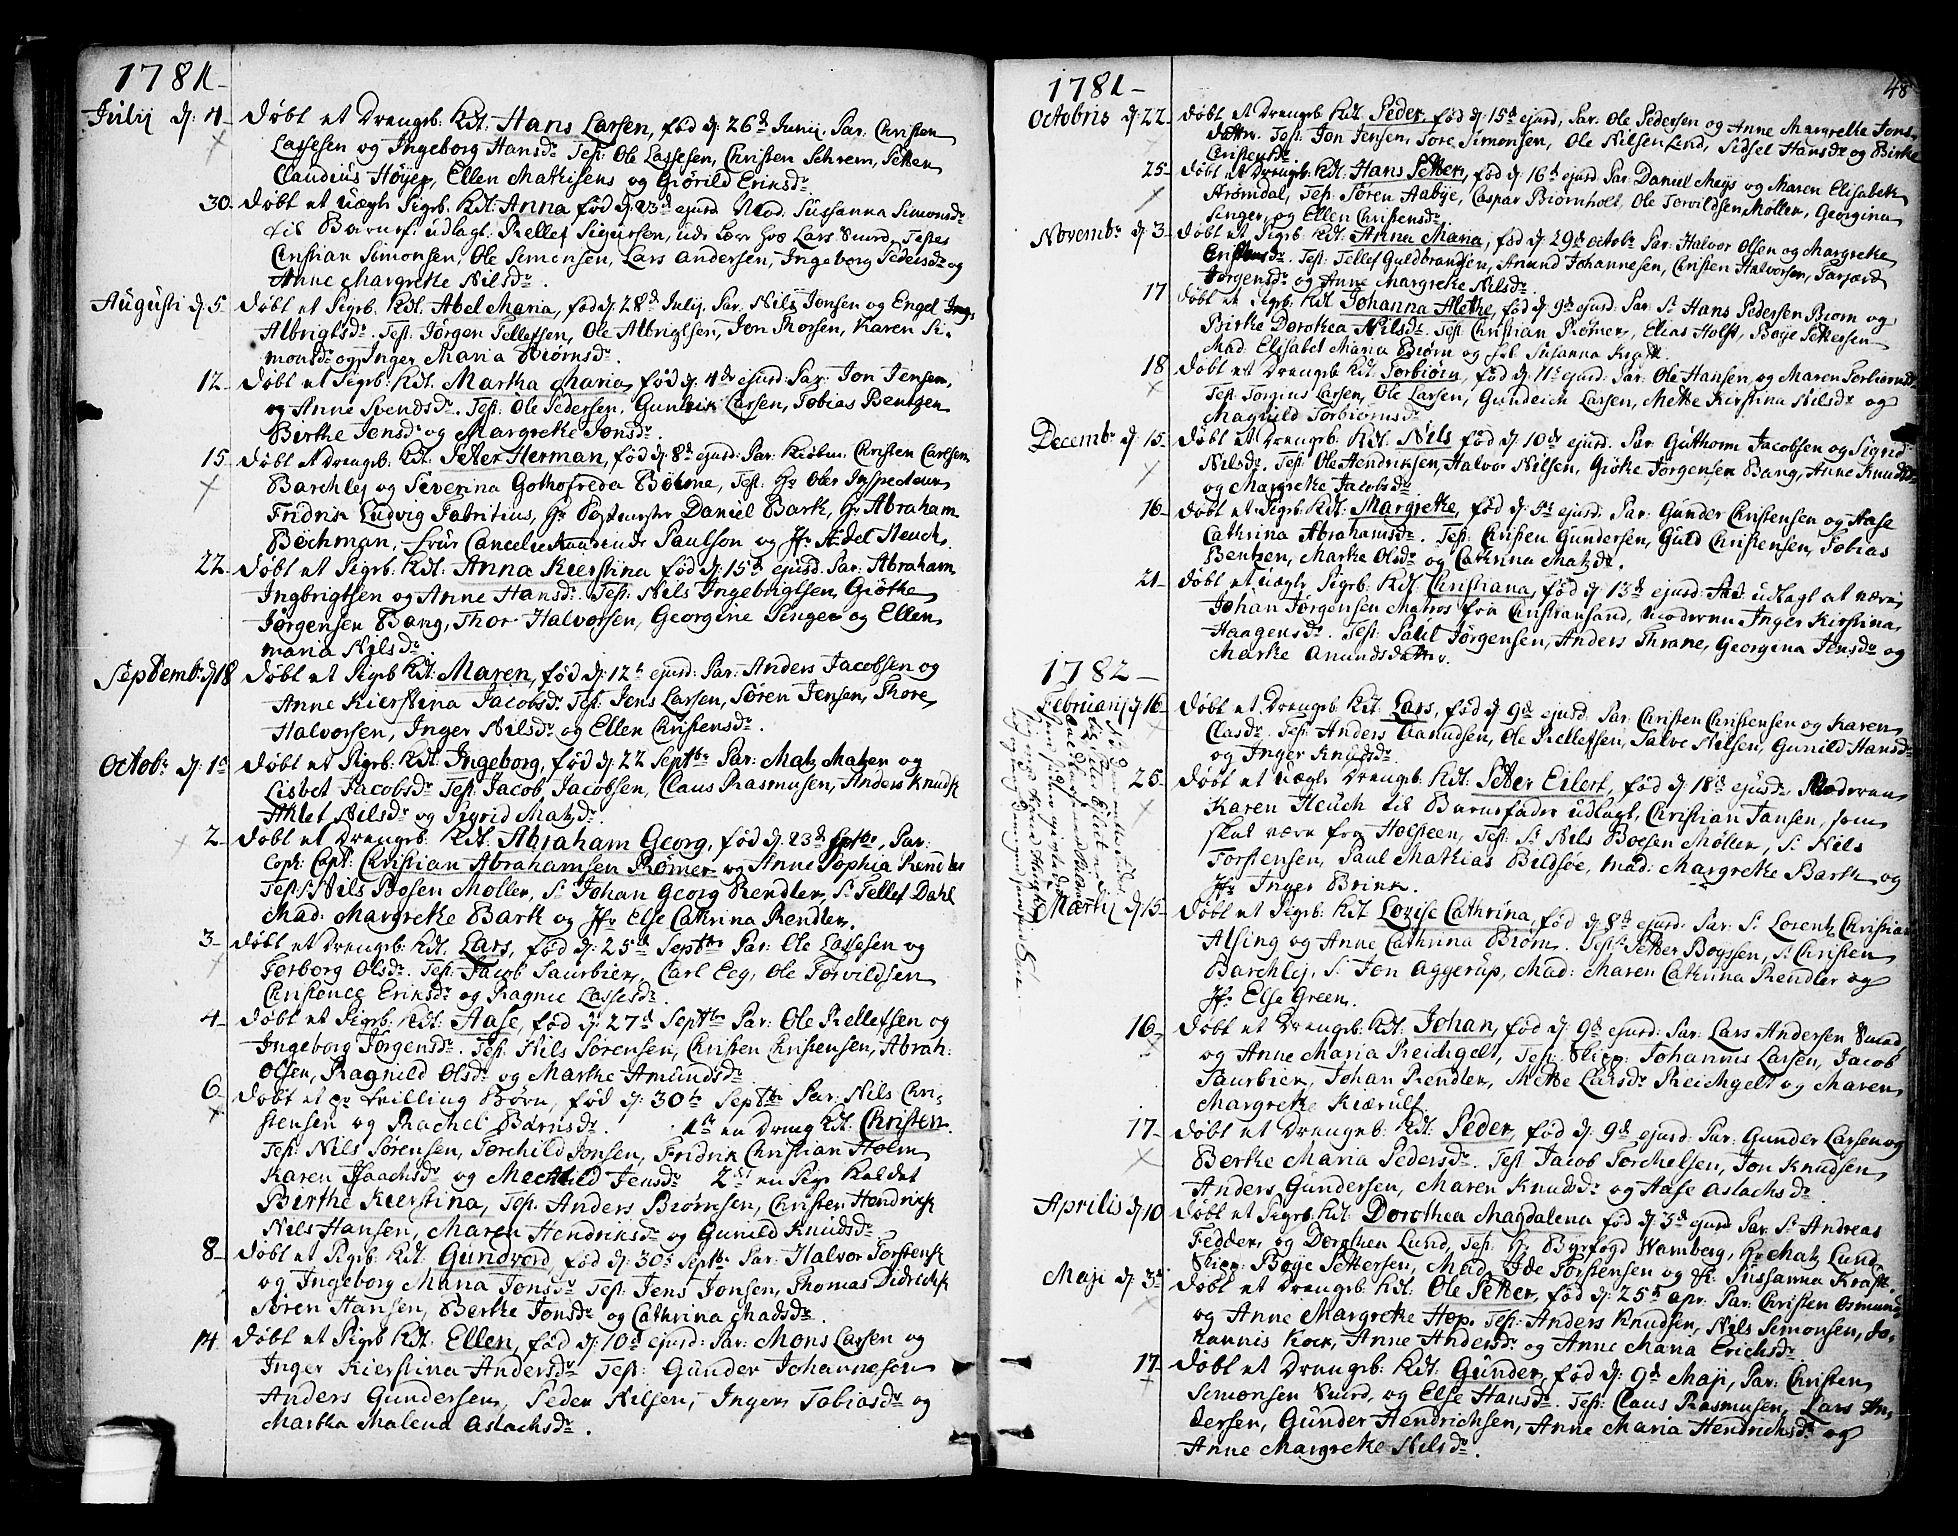 SAKO, Kragerø kirkebøker, F/Fa/L0002: Ministerialbok nr. 2, 1767-1802, s. 48